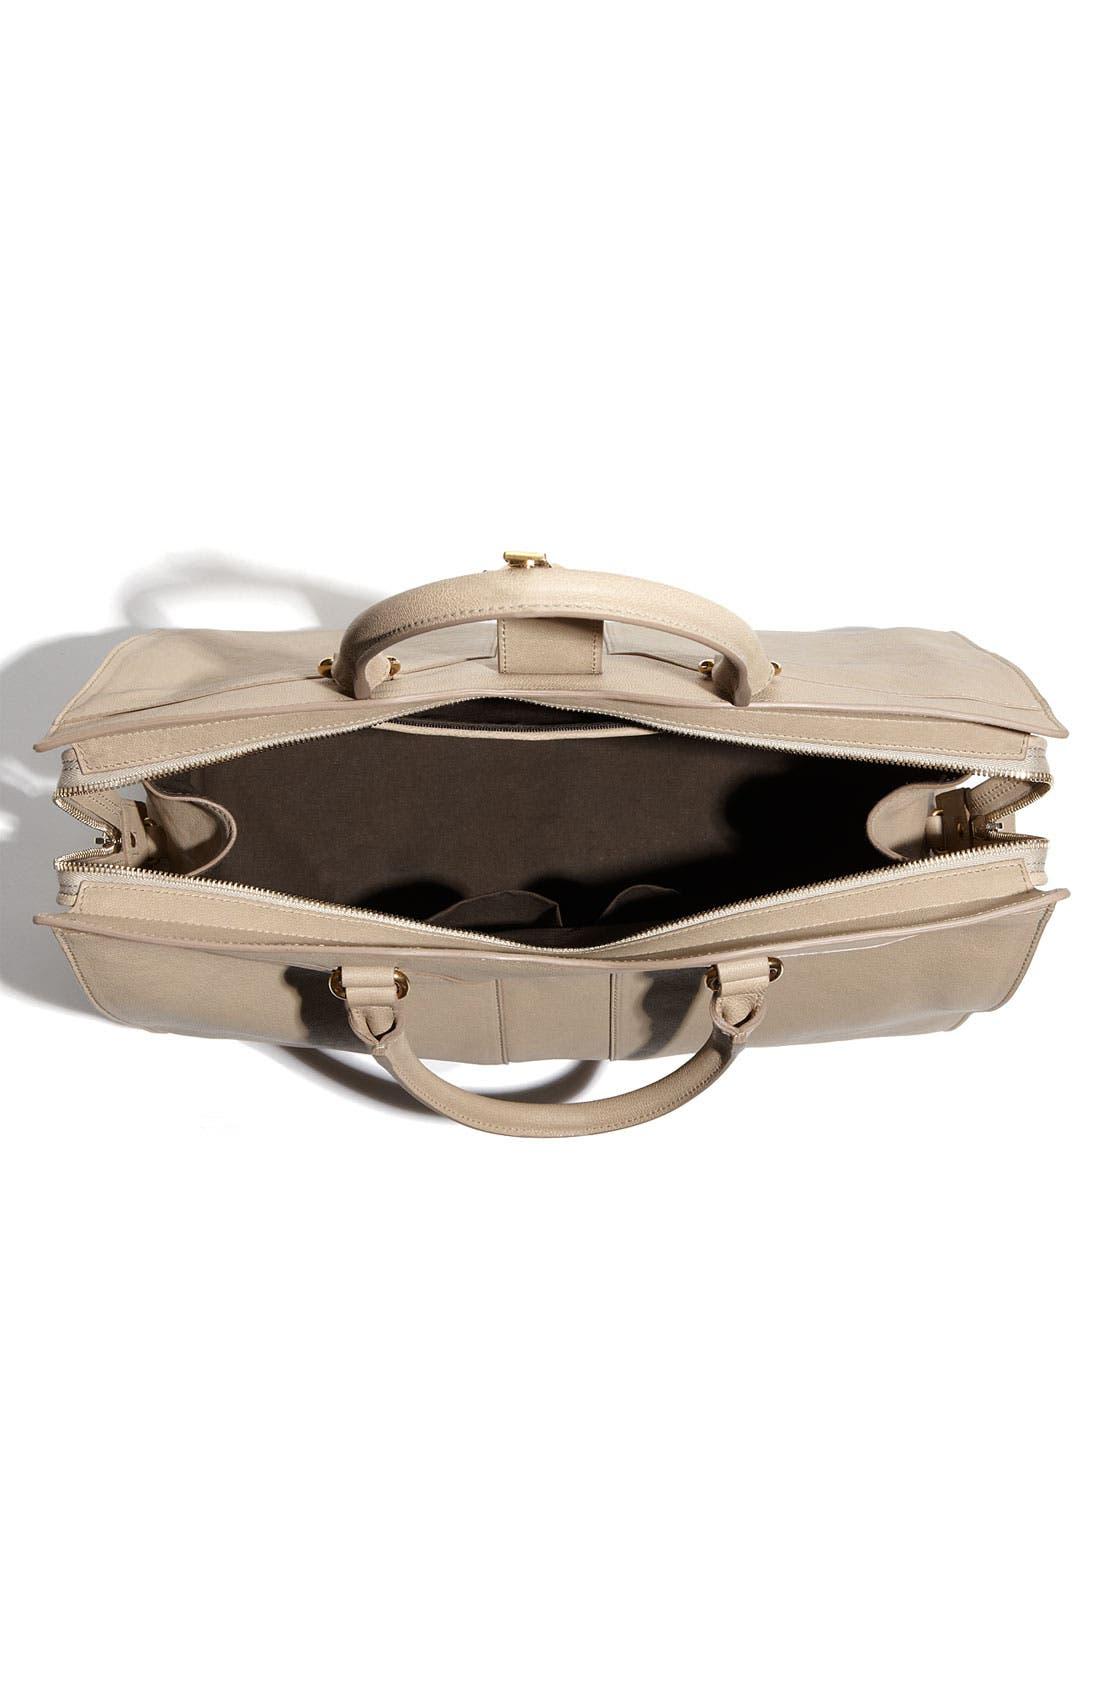 Alternate Image 3  - Yves Saint Laurent 'Cabas Chyc - Large' Leather Satchel